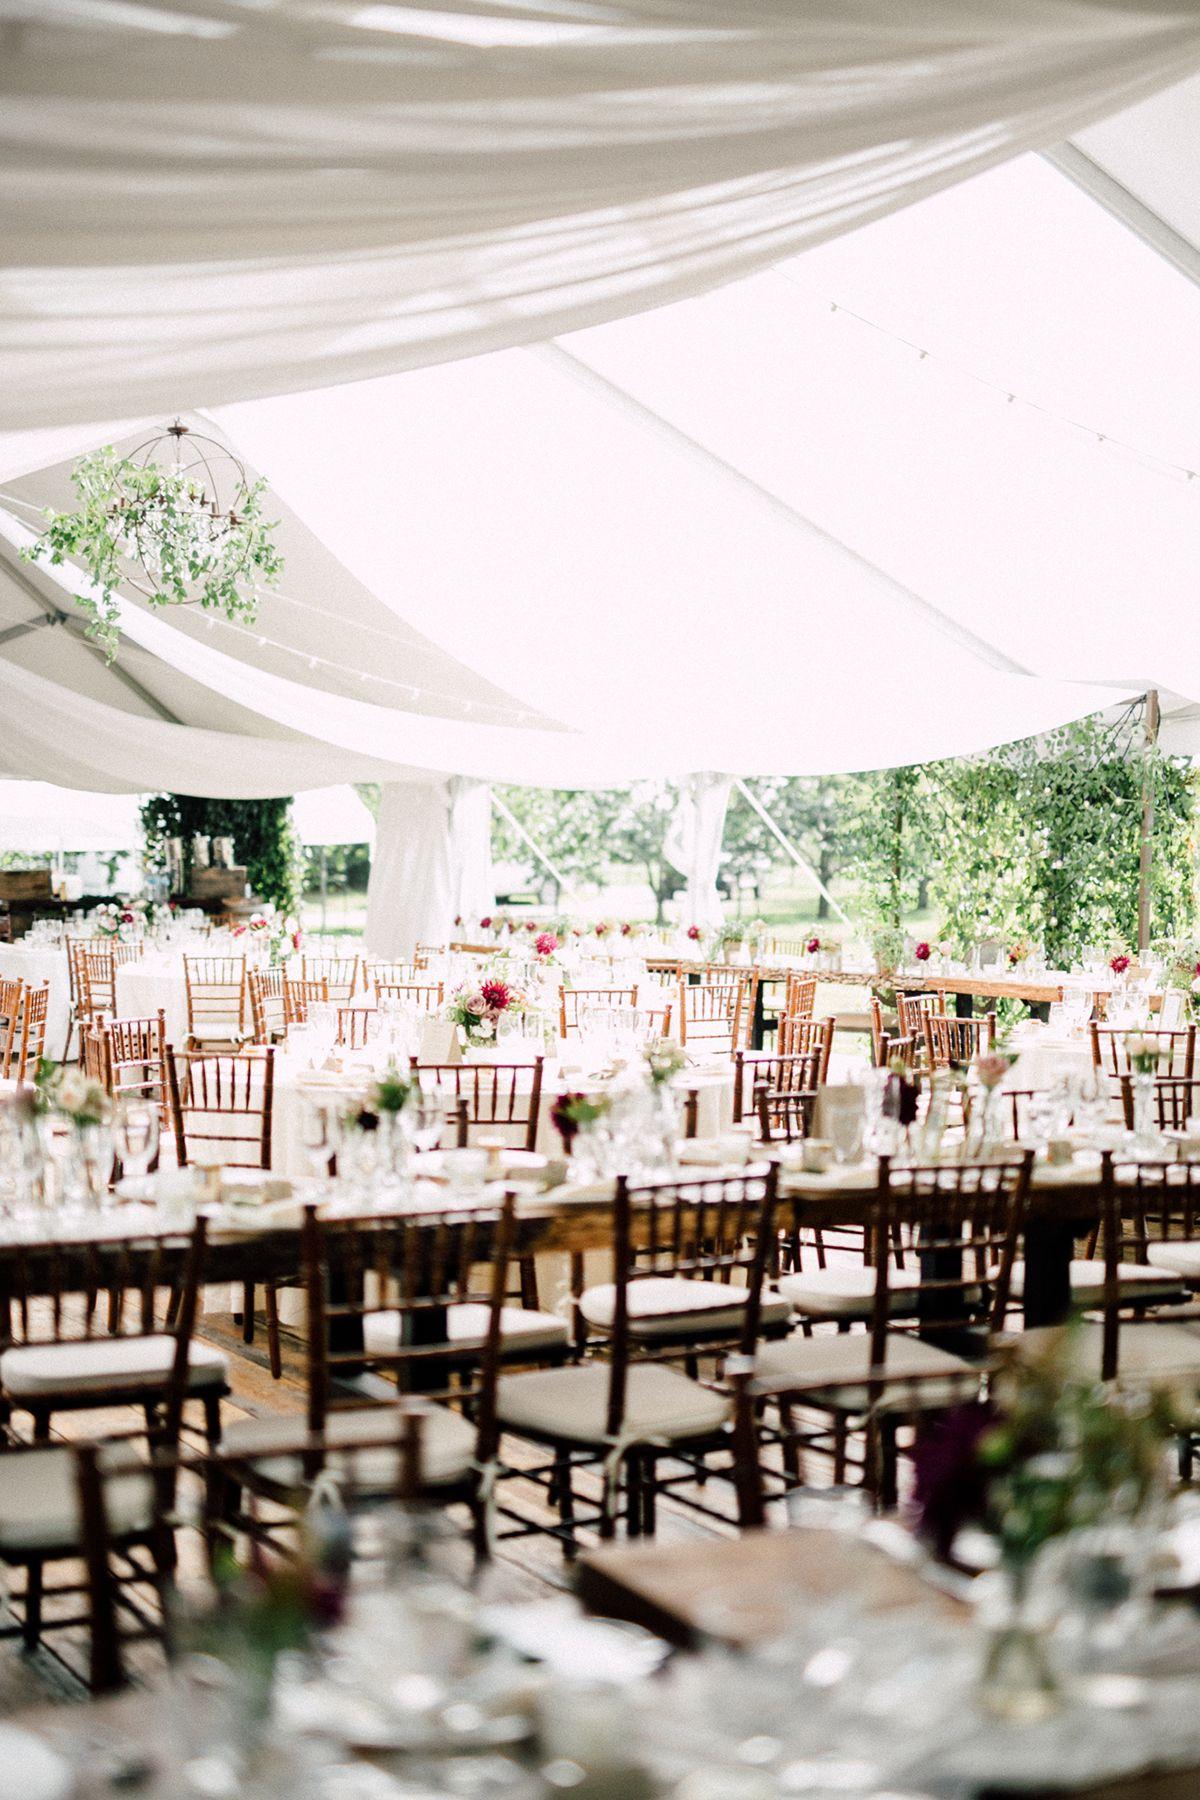 Chic Niagara On The Lake Vineyard Wedding Ruffled Vineyard Wedding Dress Vineyard Wedding Wedding Venues Ontario